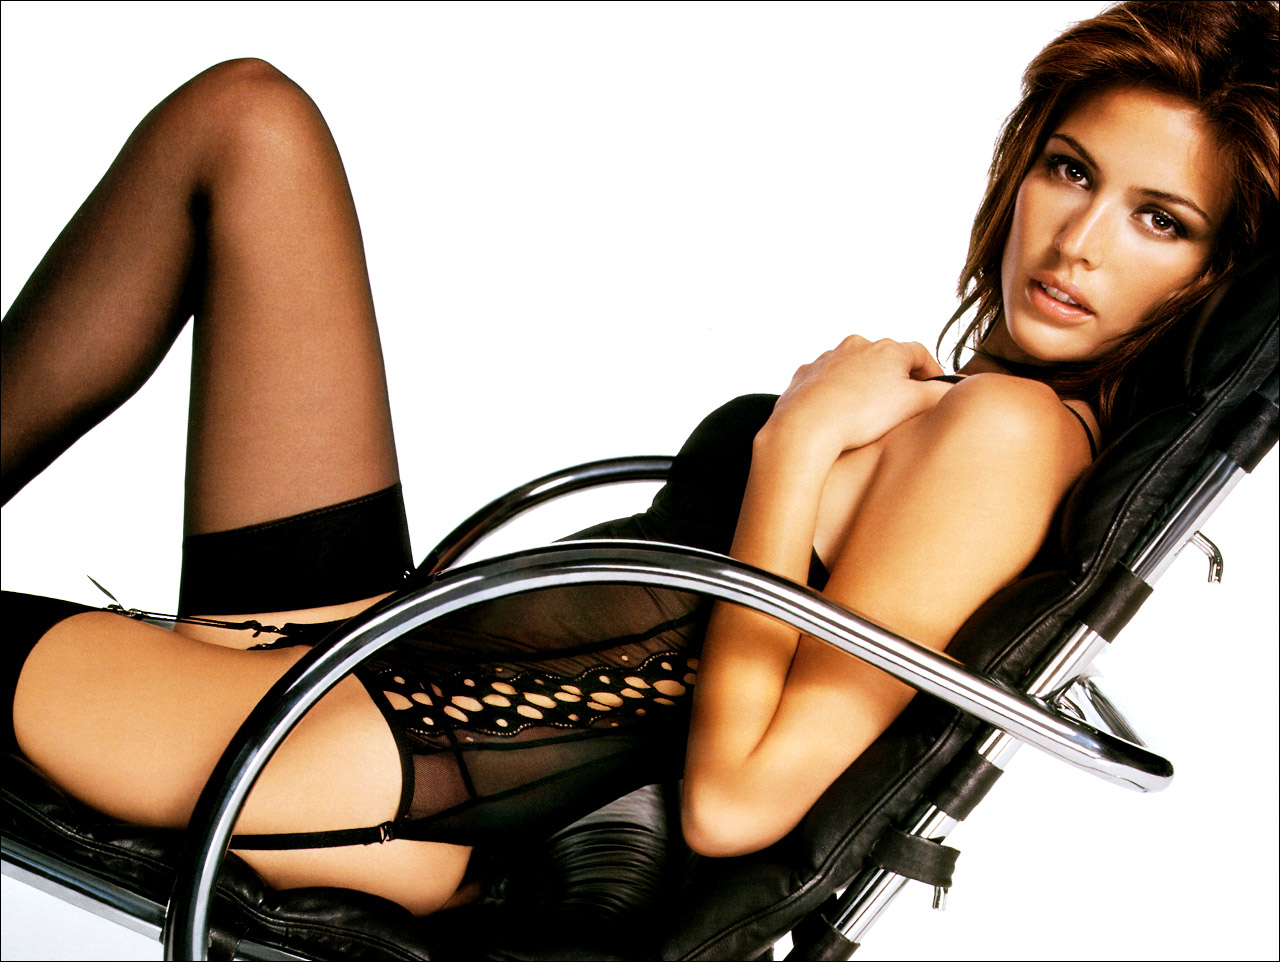 Hot nfs sex pics sexy tubes